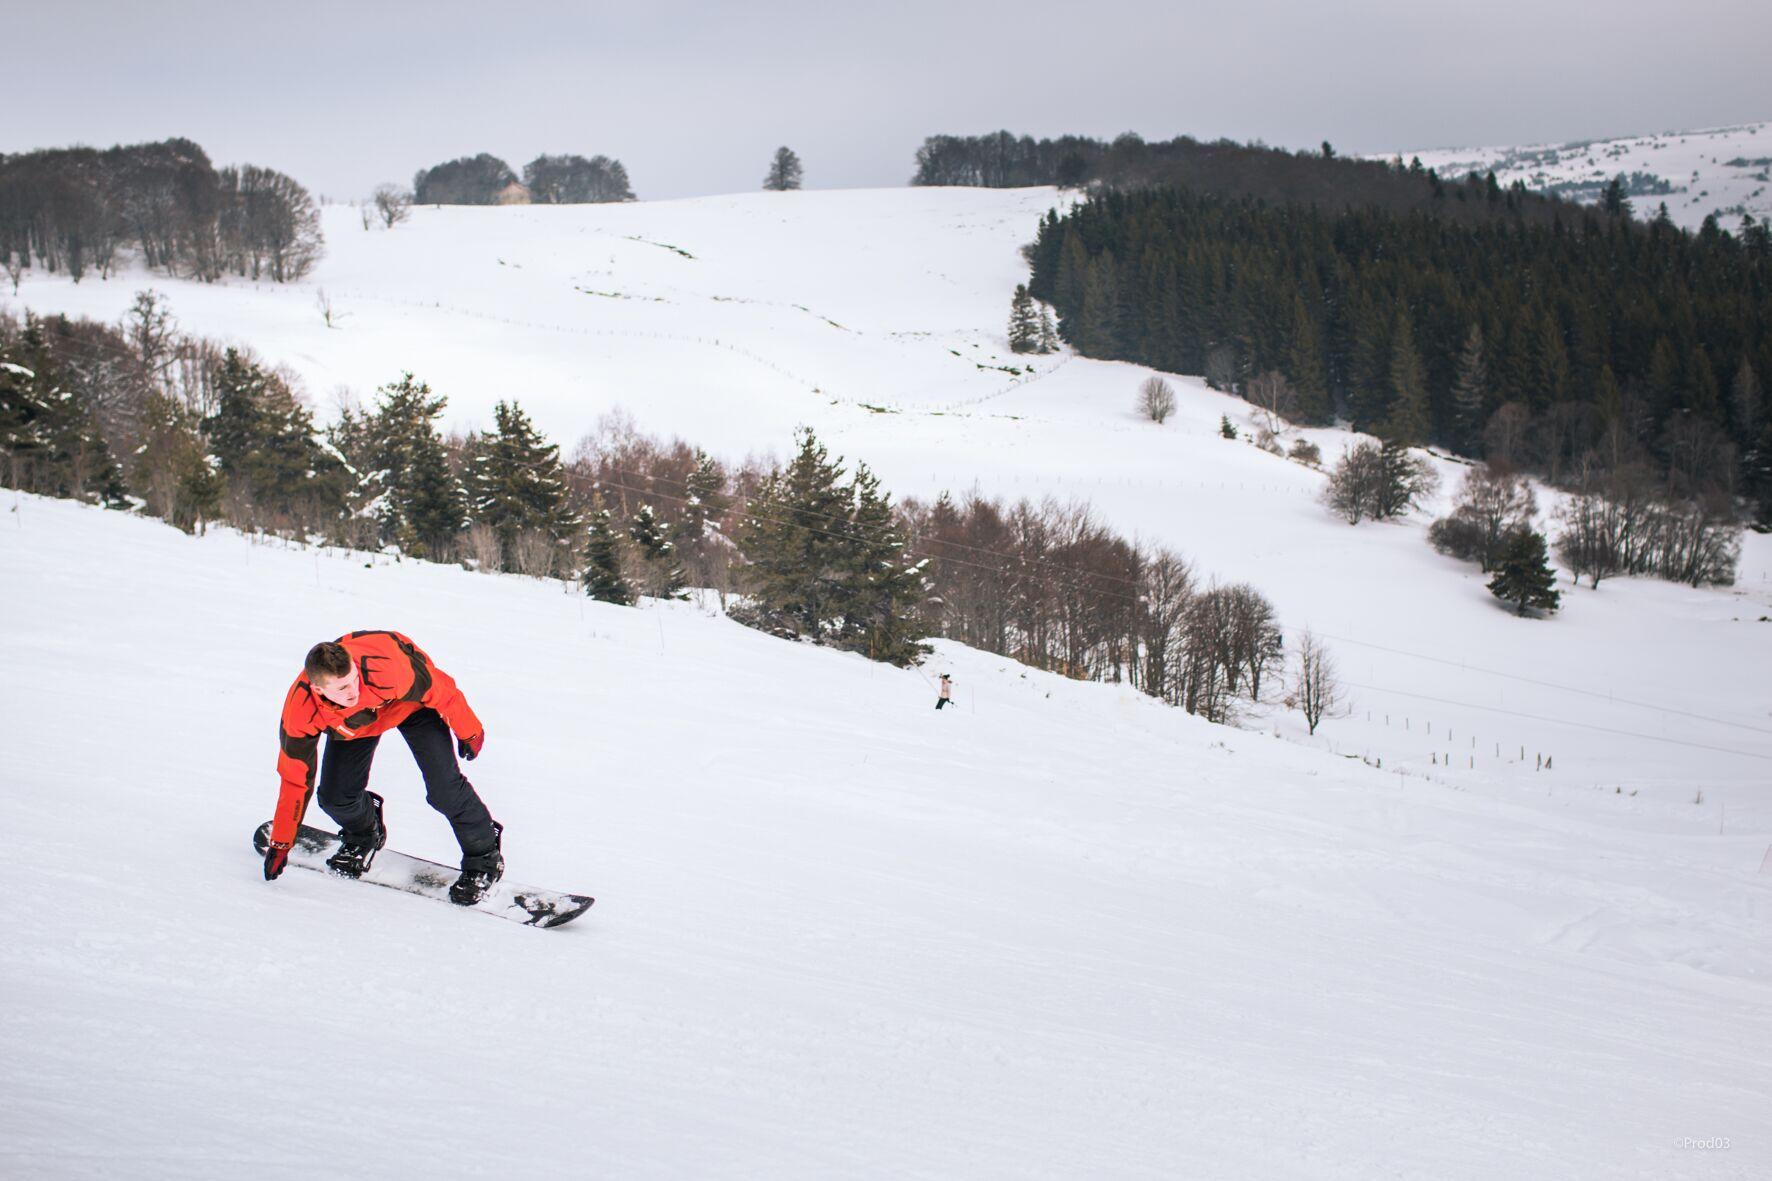 praboure-snowboard-2